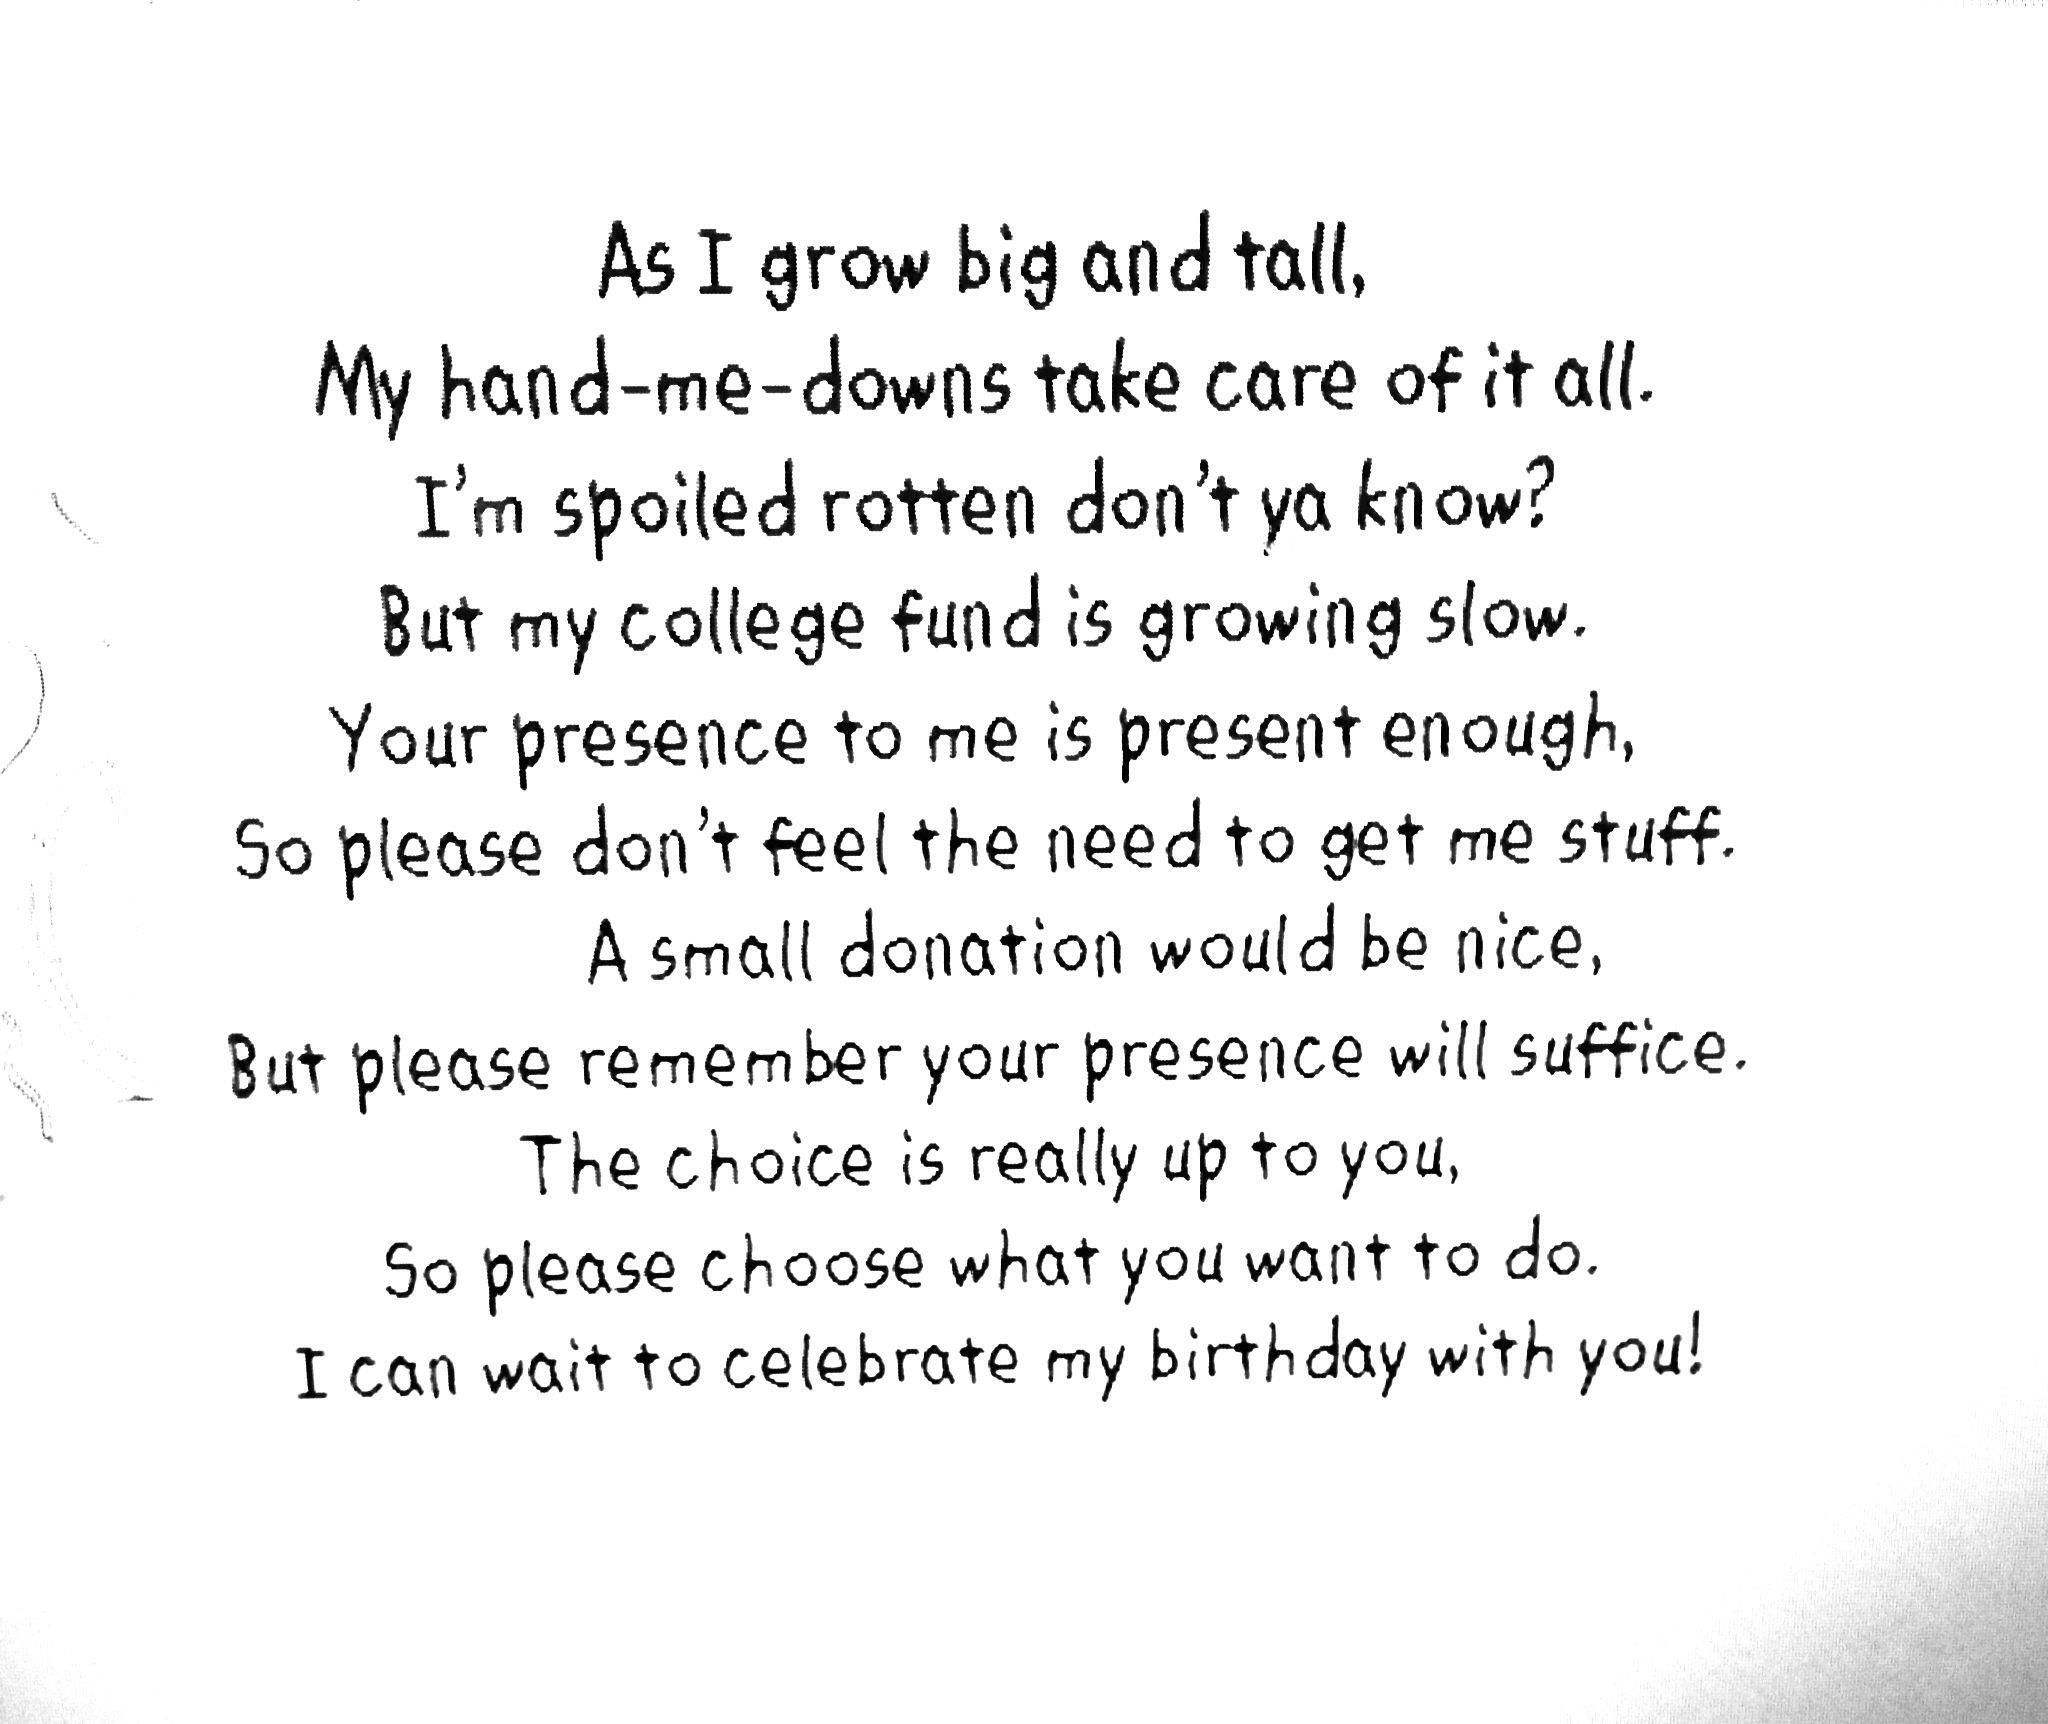 Poem for Birthday Invitation to help raise college fund money in a ...